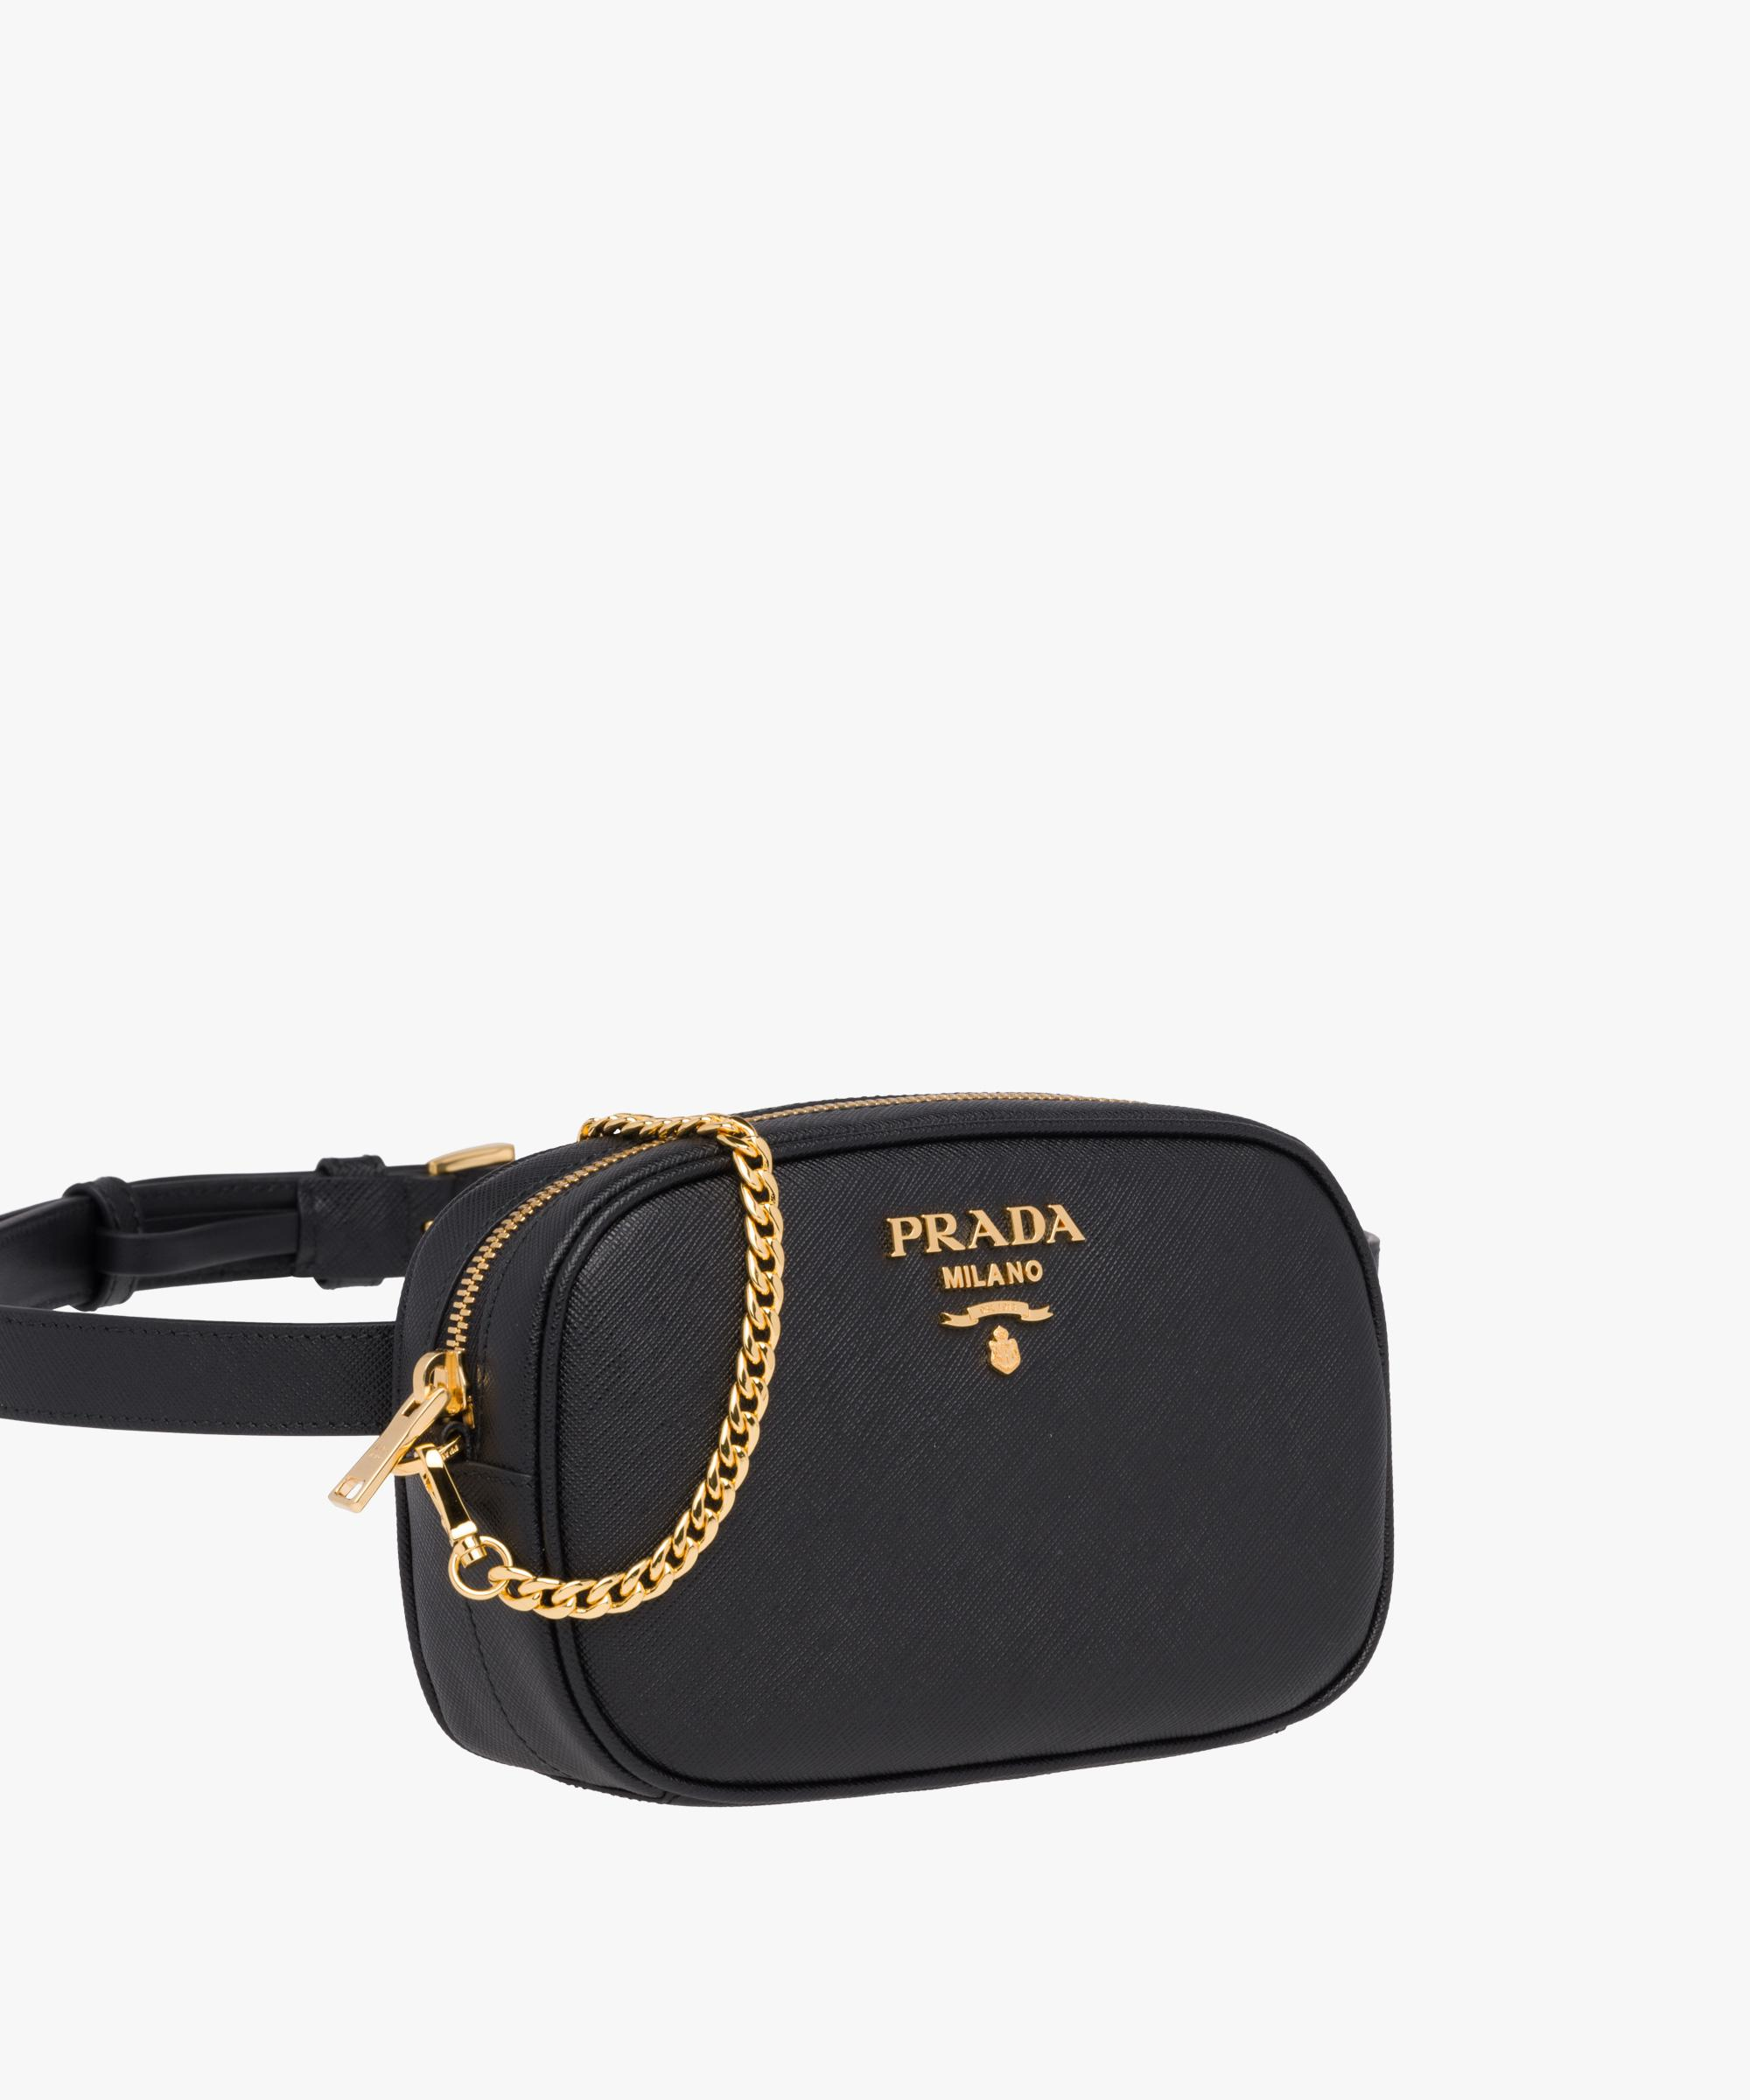 d7f40d5e2923cb where can i buy lyst prada saffiano leather belt bag in black 1d6d7 40034